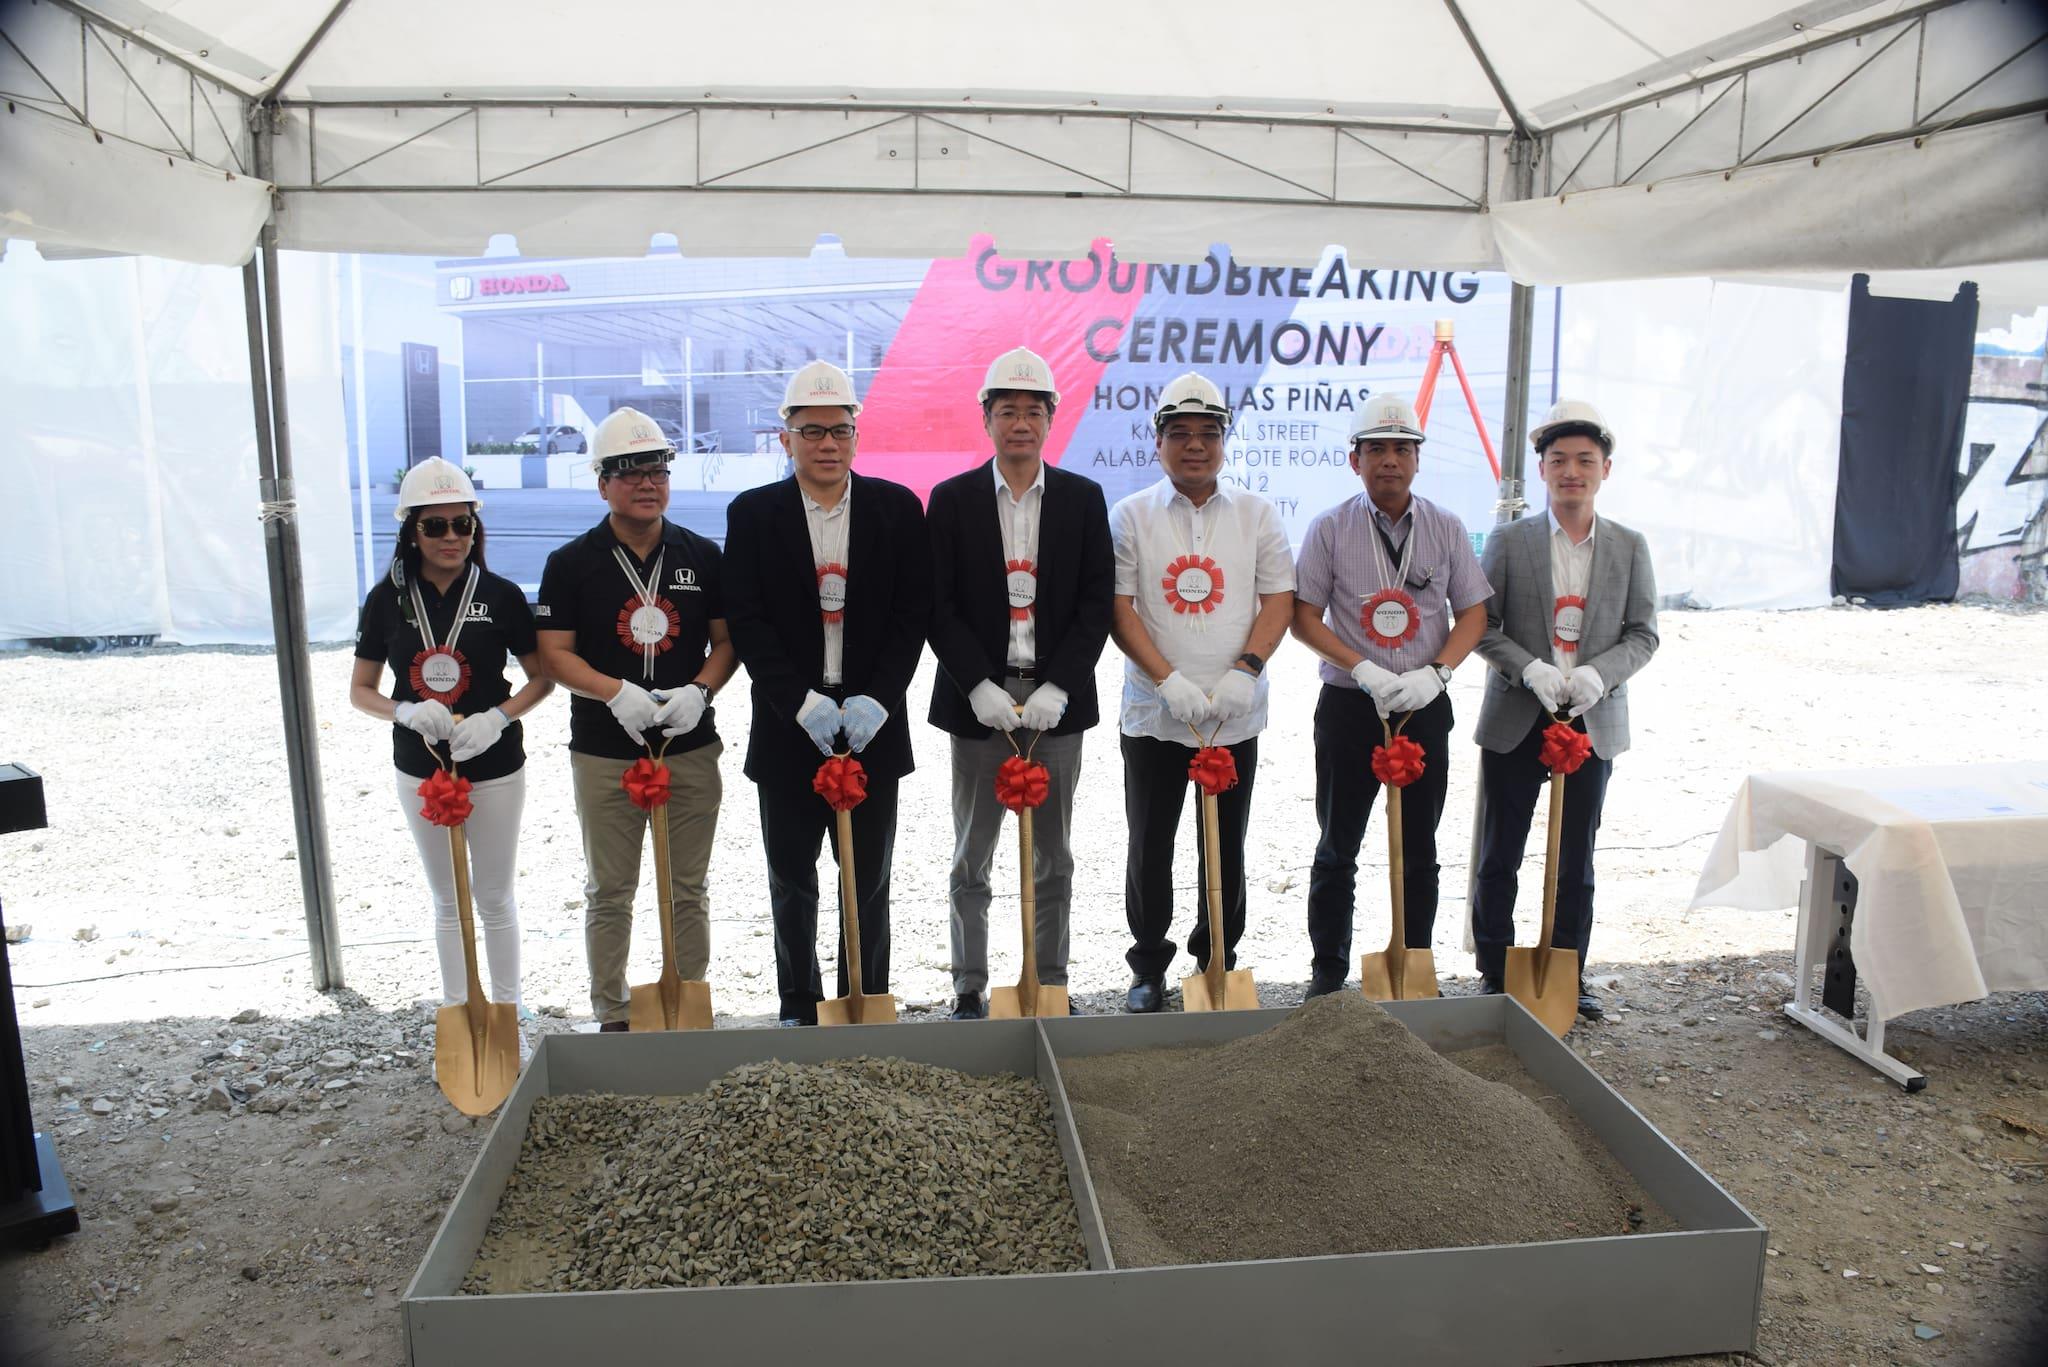 Honda Cars Dealership to Open Soon in Las Piñas